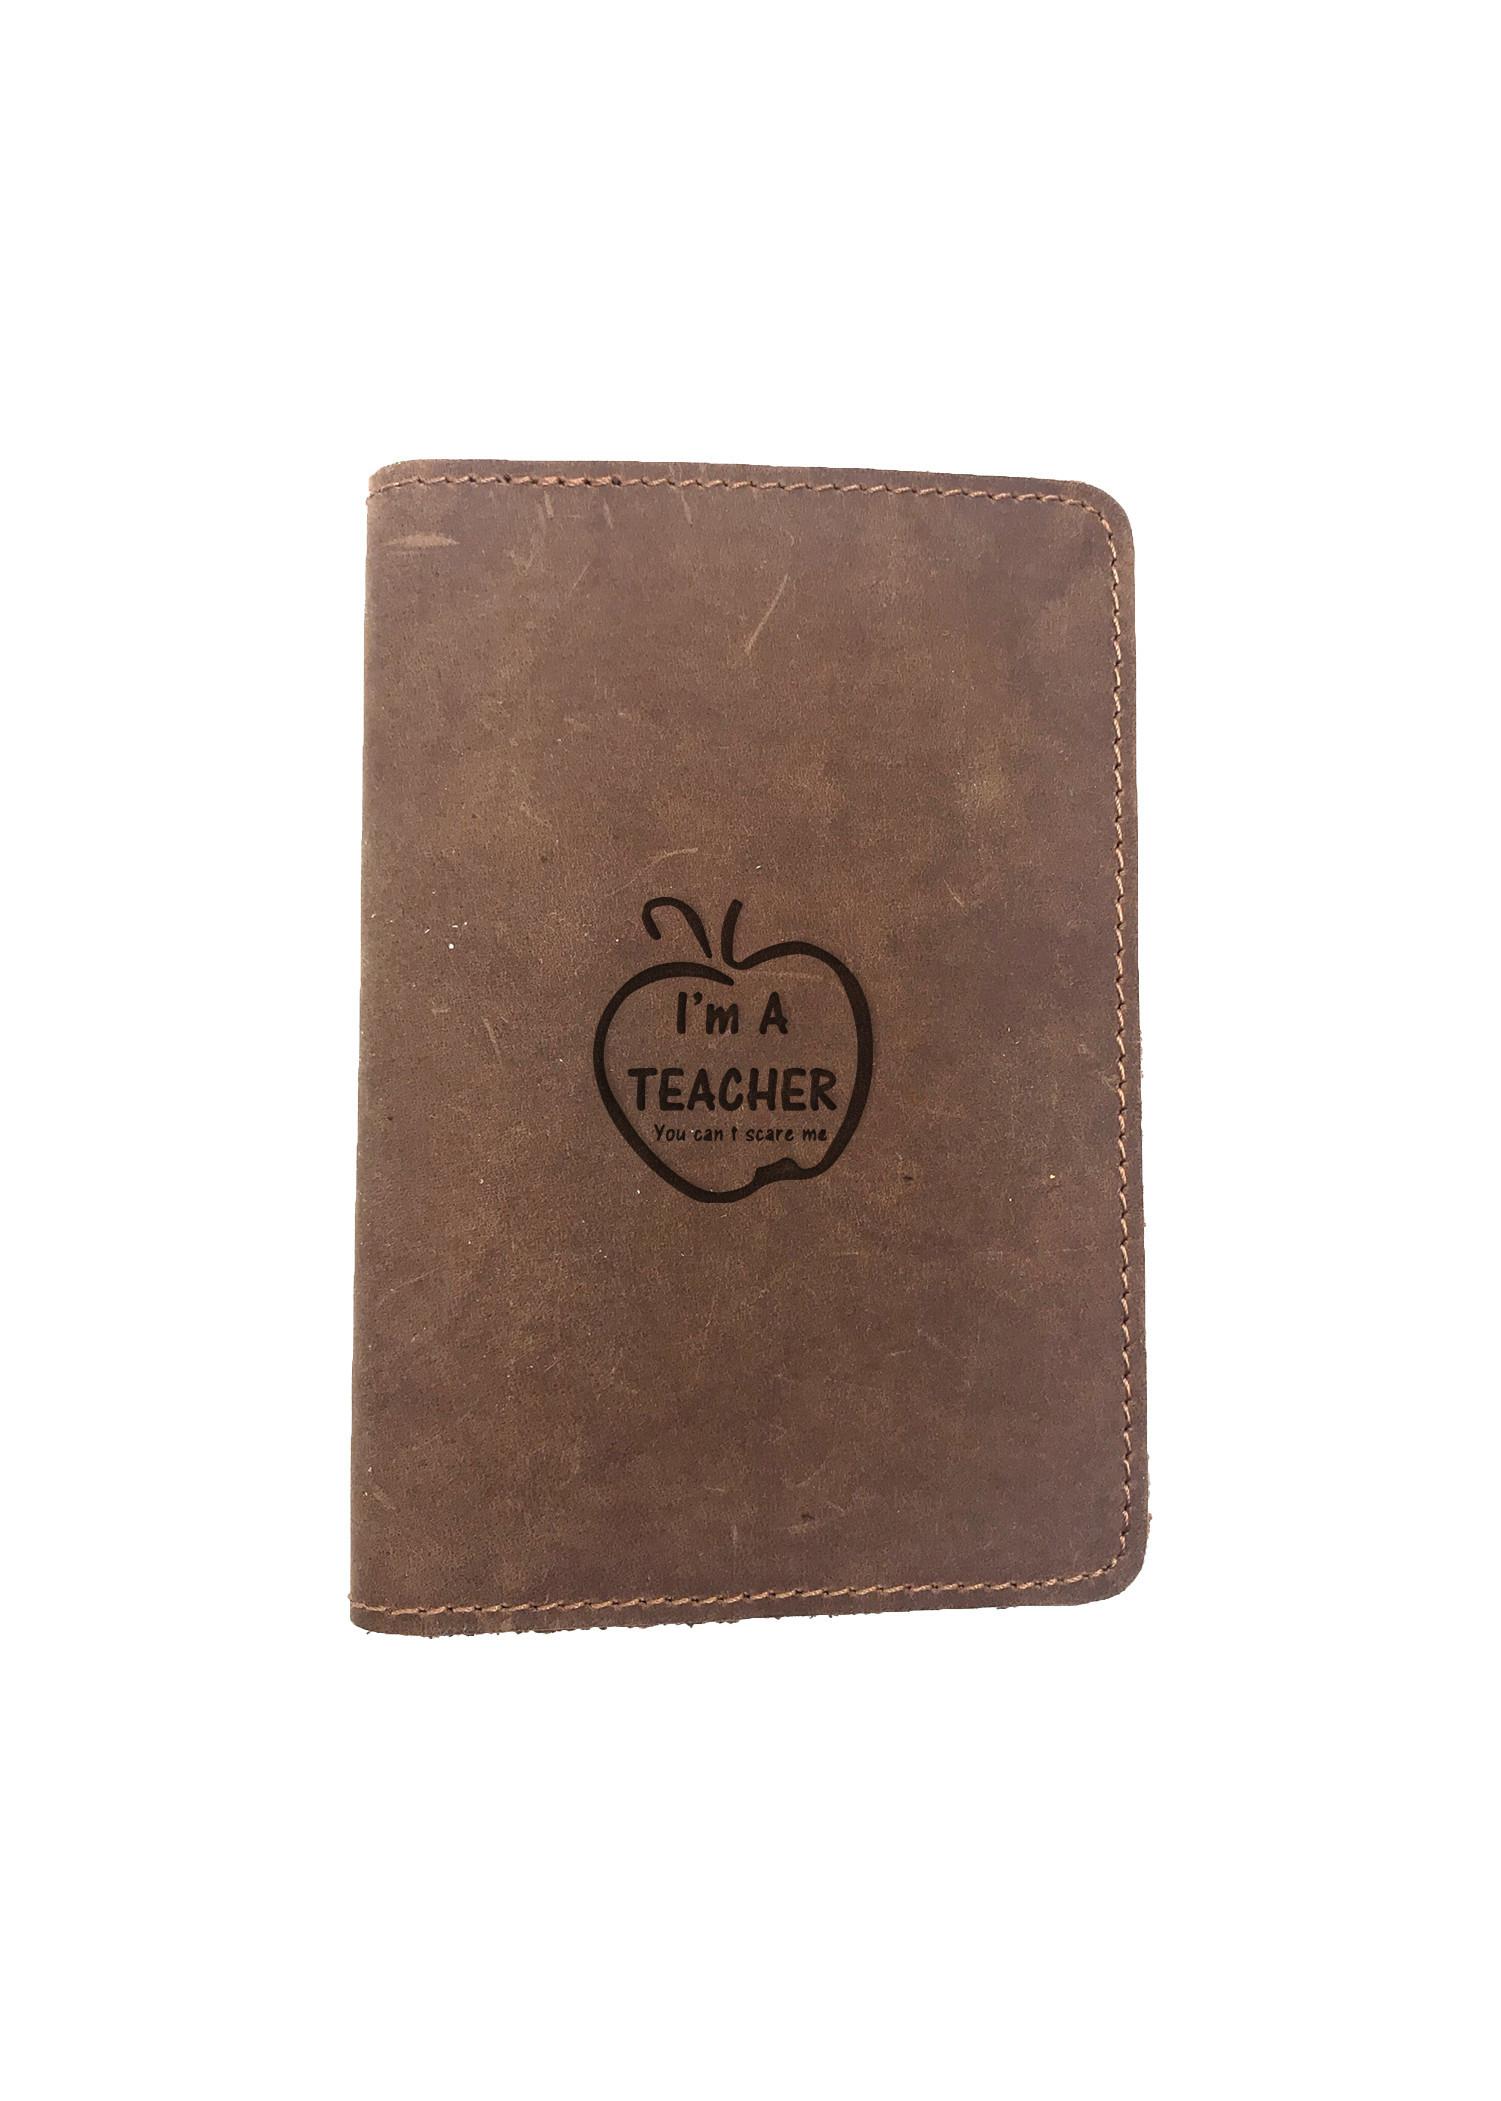 Passport Cover Bao Da Hộ Chiếu Da Sáp Khắc Hình Hình IM A TEACHER (BROWN)